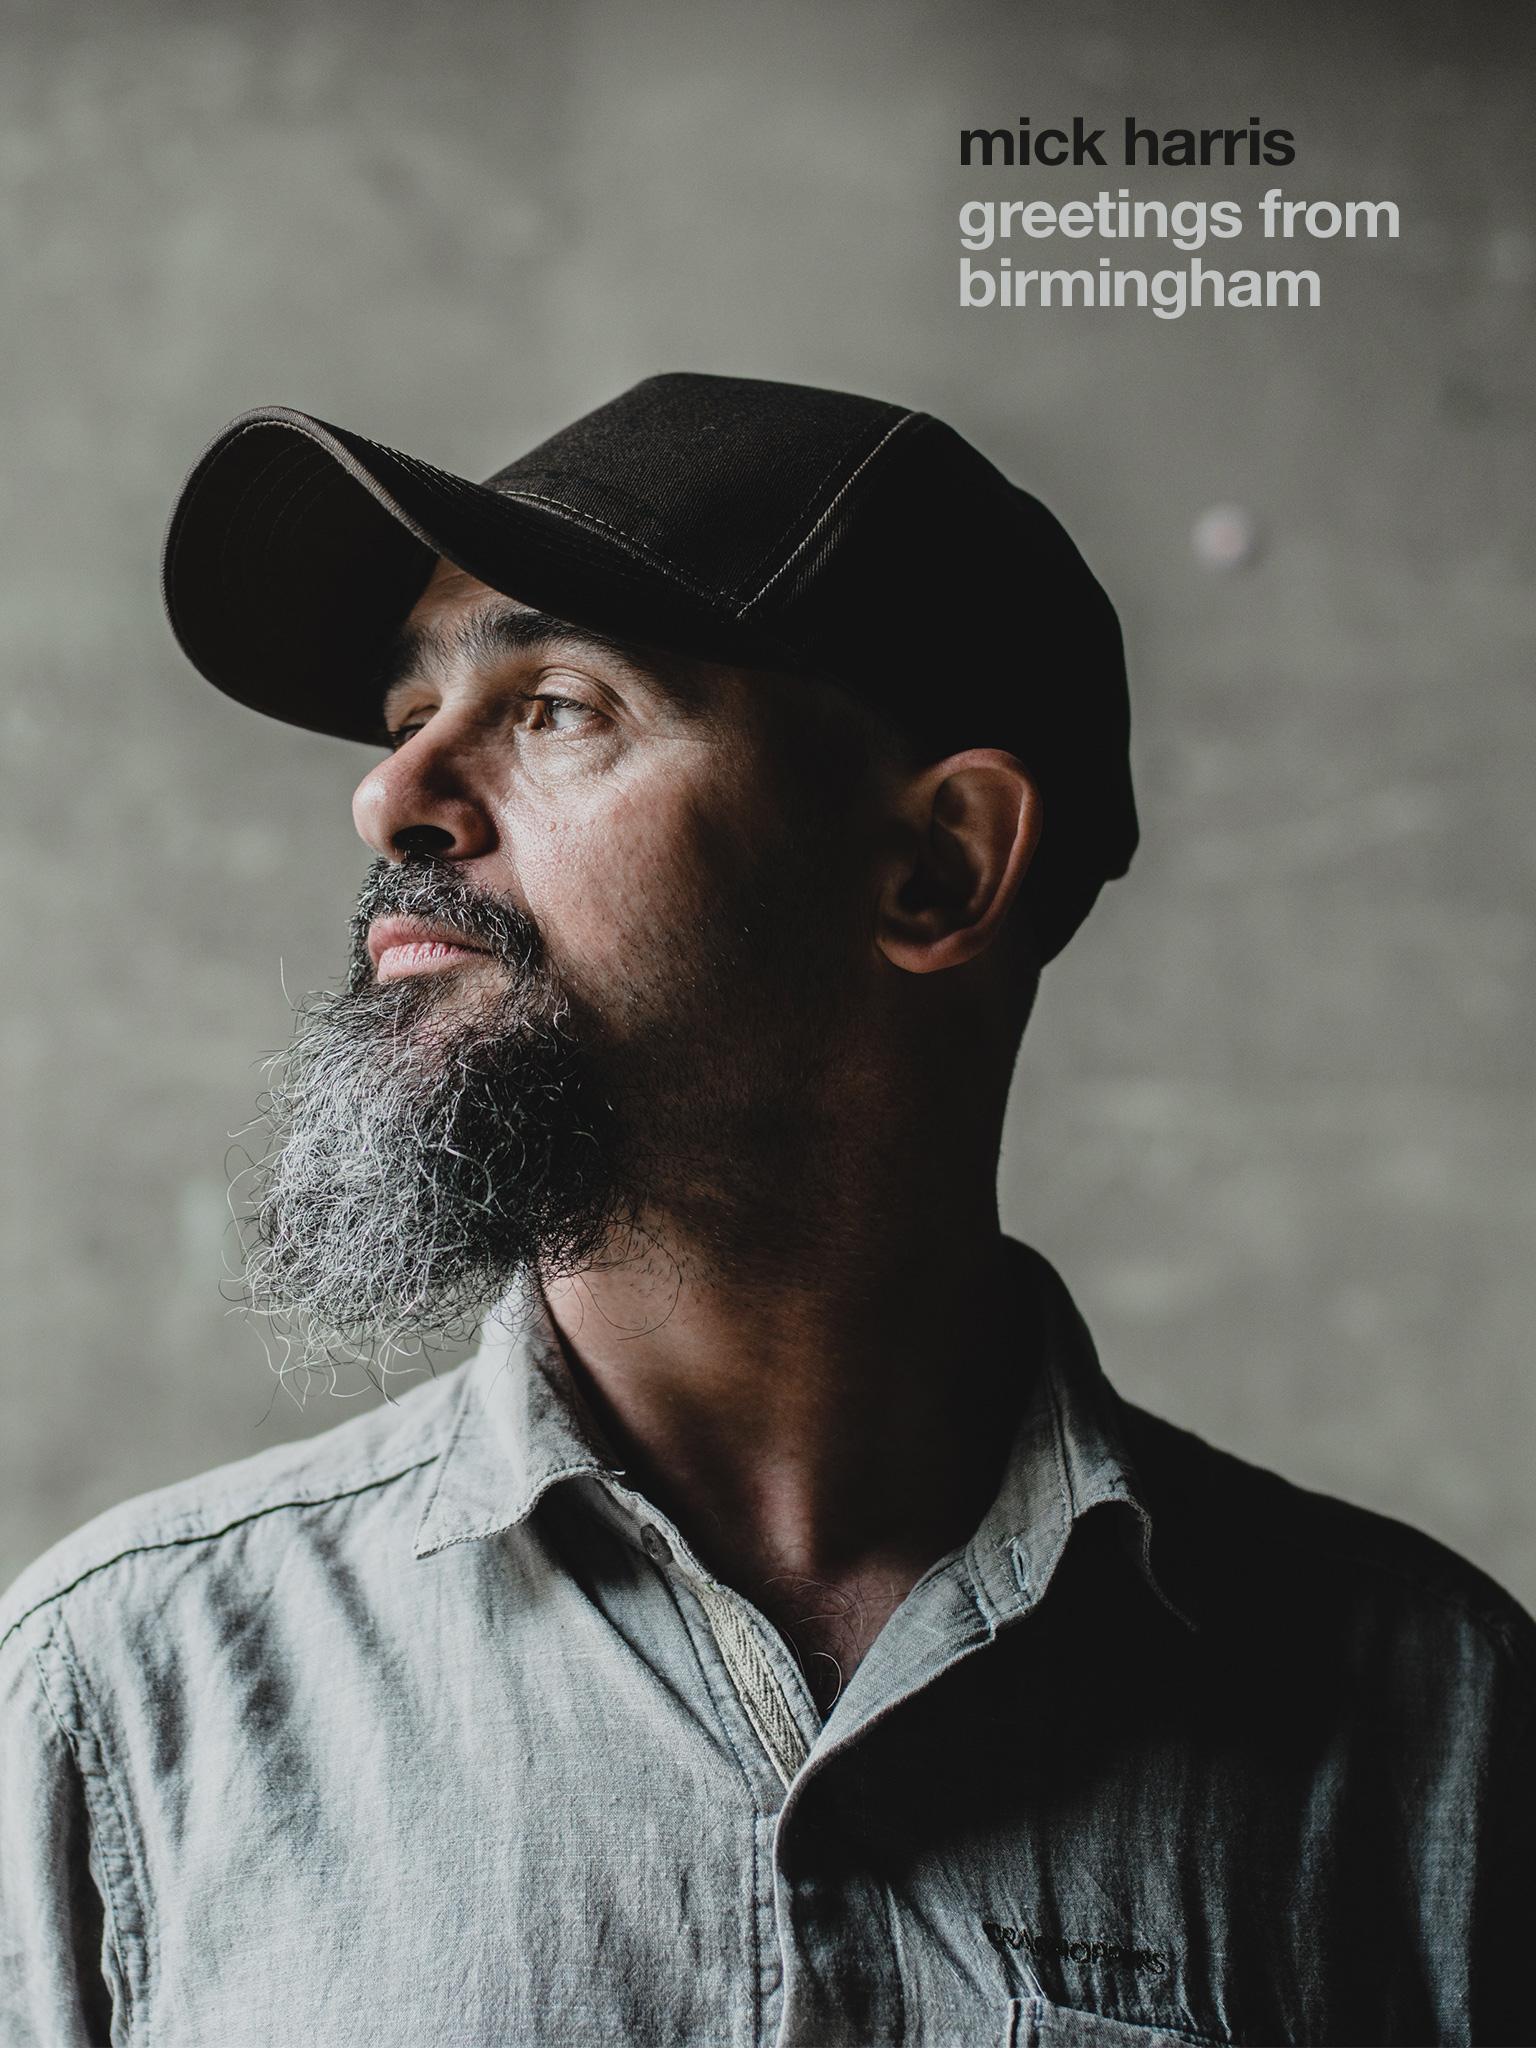 Mick Harris: Greetings from Birmingham